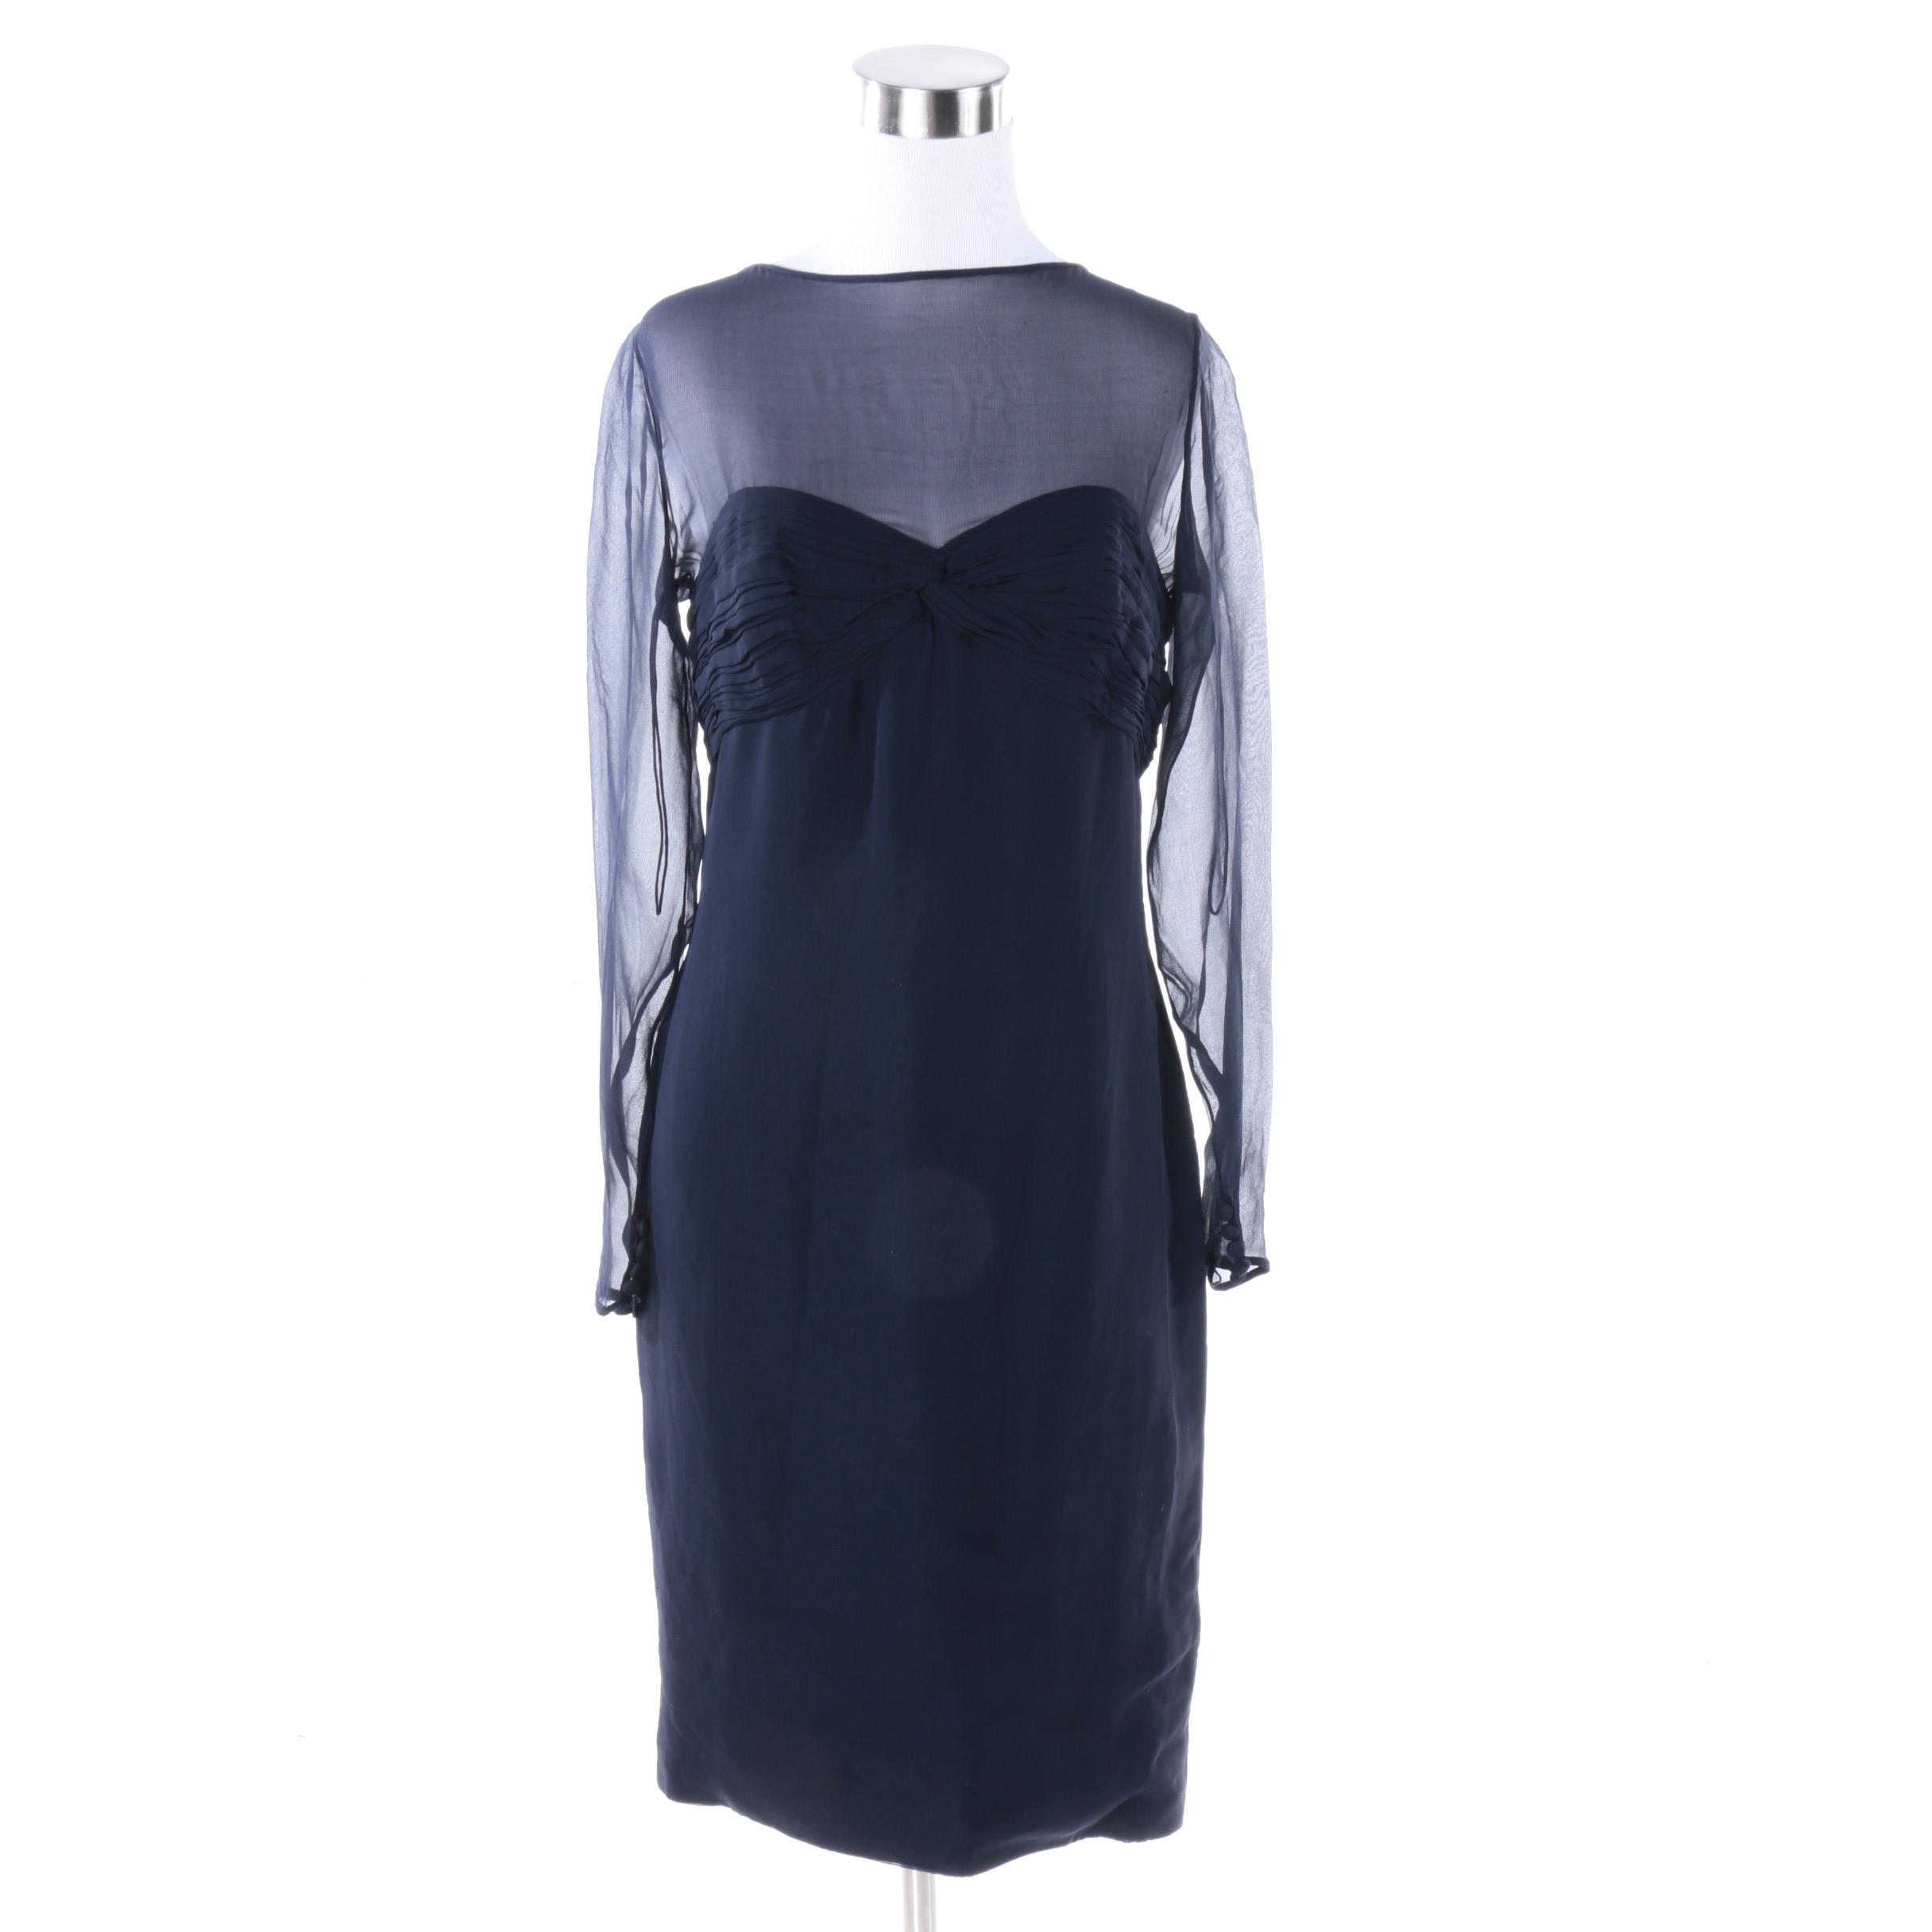 1980s Vintage Stanley Platos - Martin Ross Navy Blue Cocktail Dress